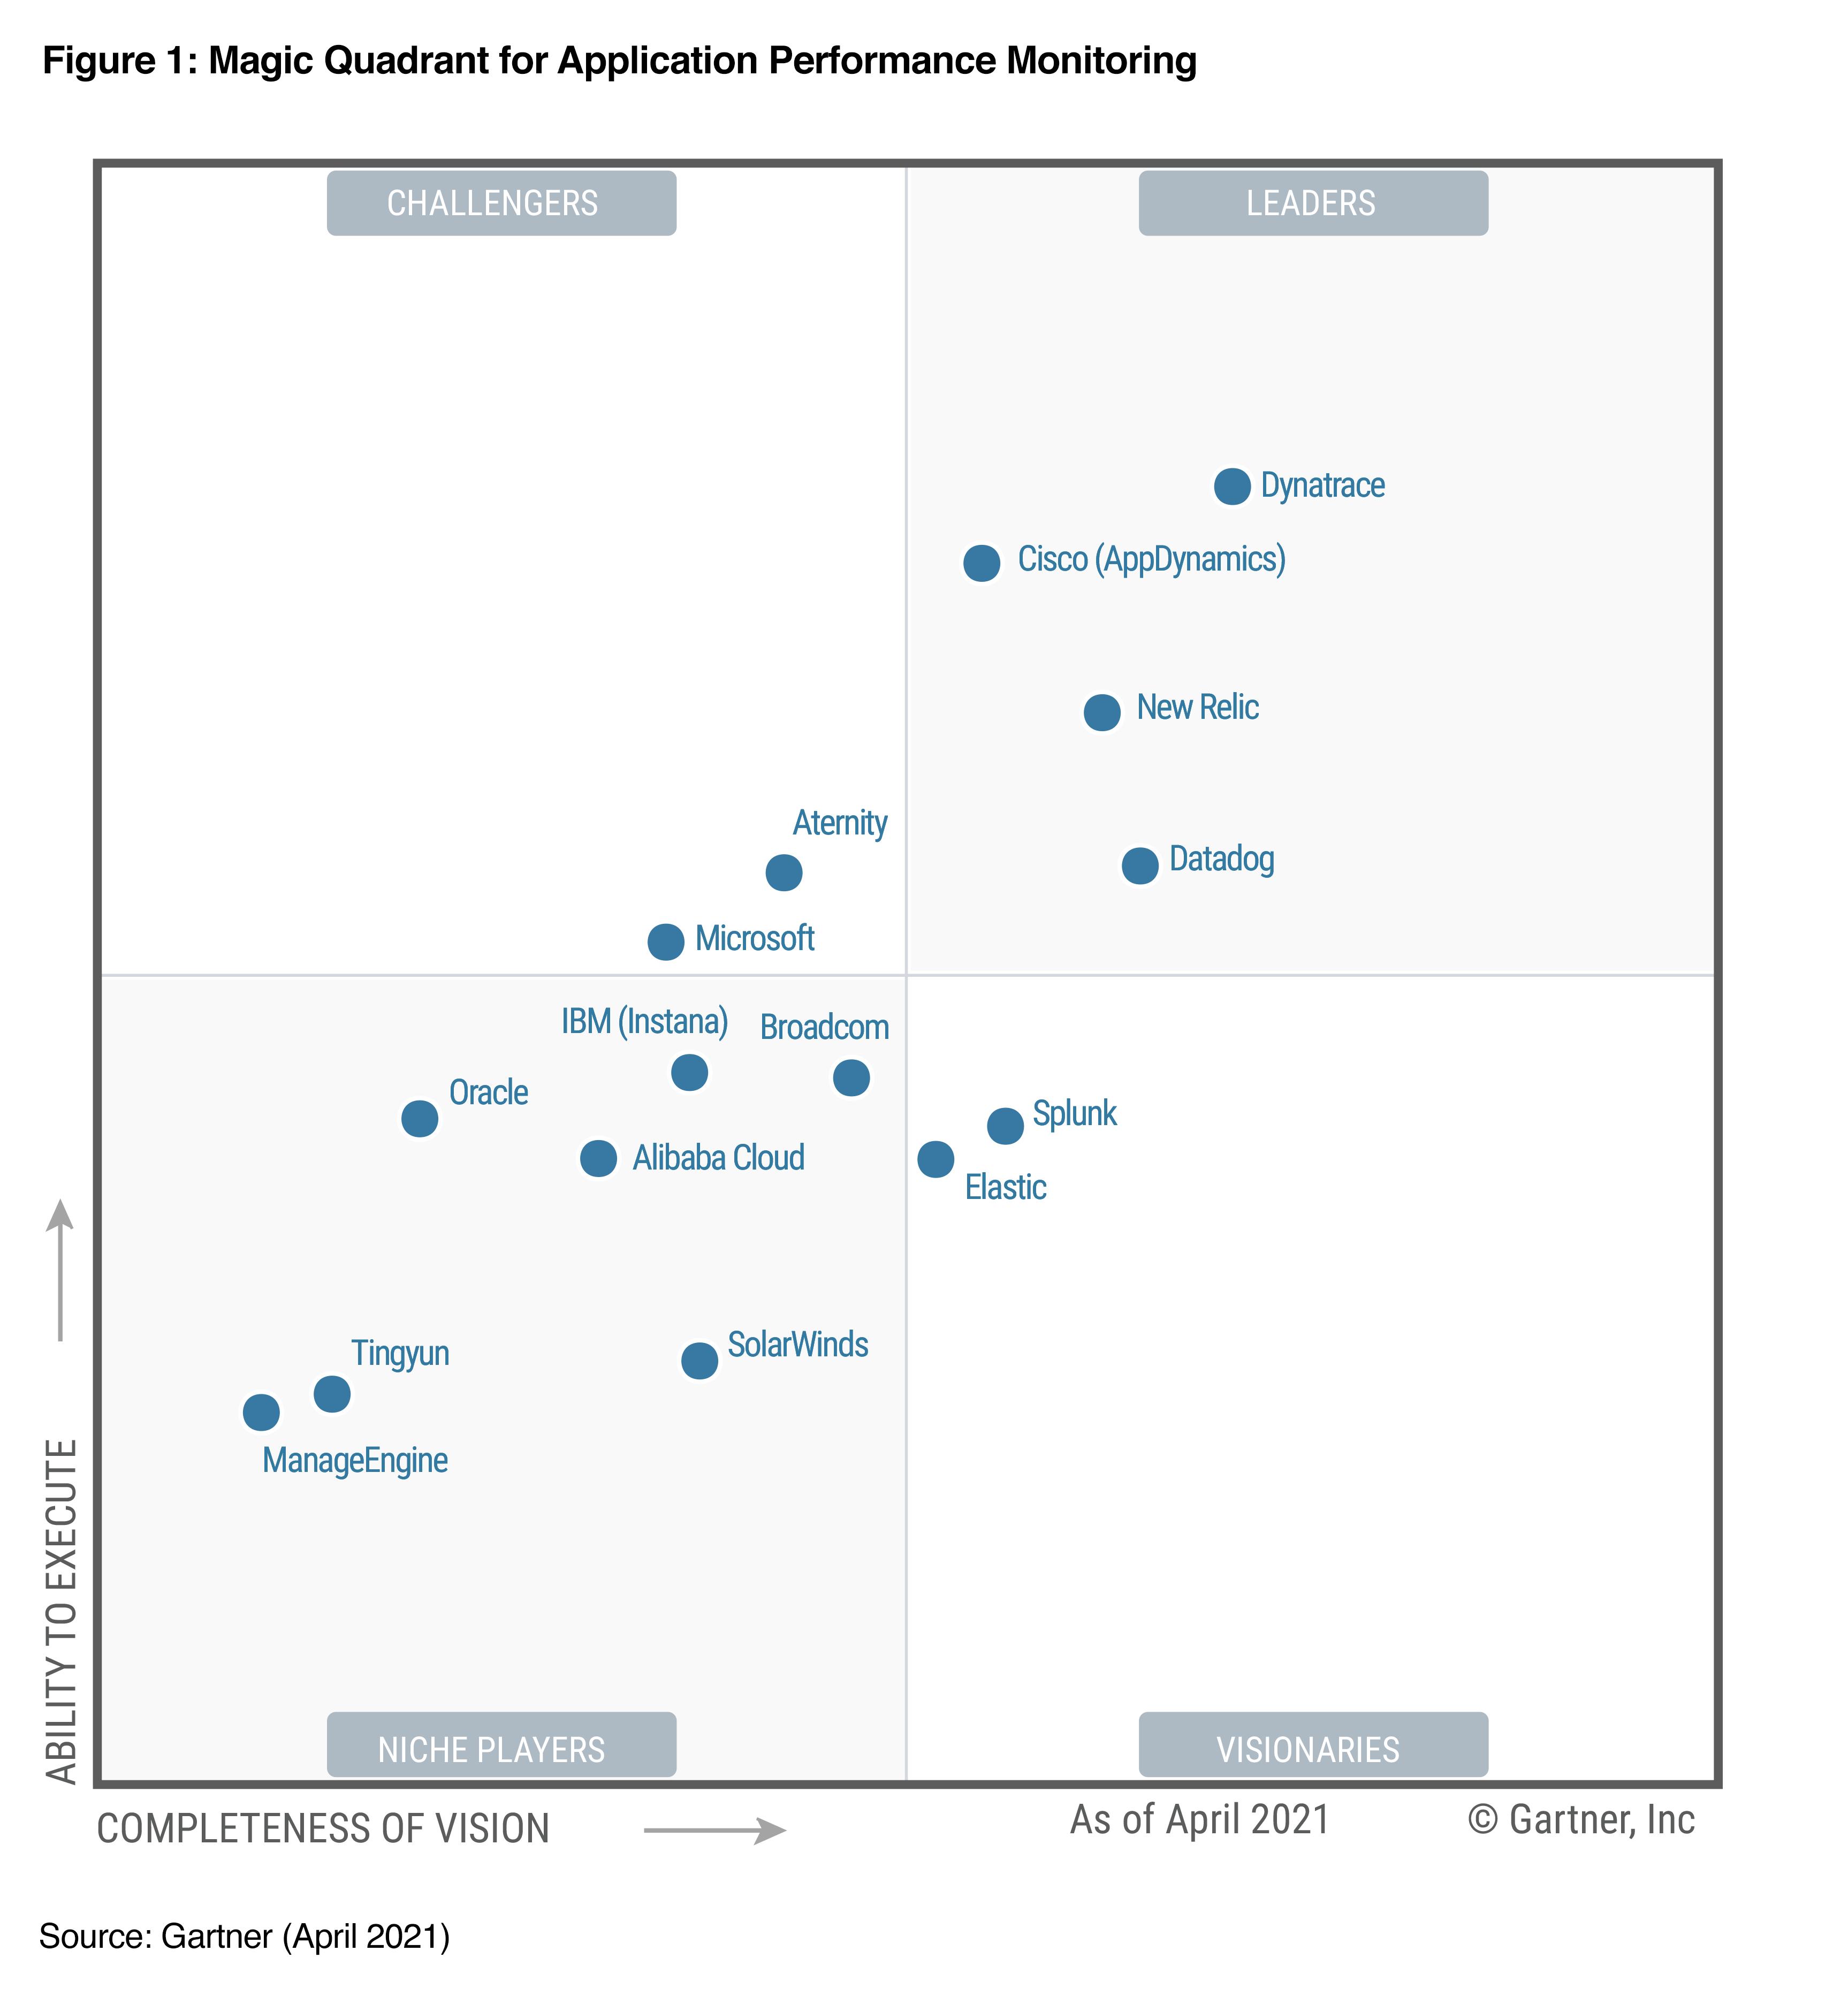 graphic-gartner-magic-quadrant-application-performance-monitoring-research.png